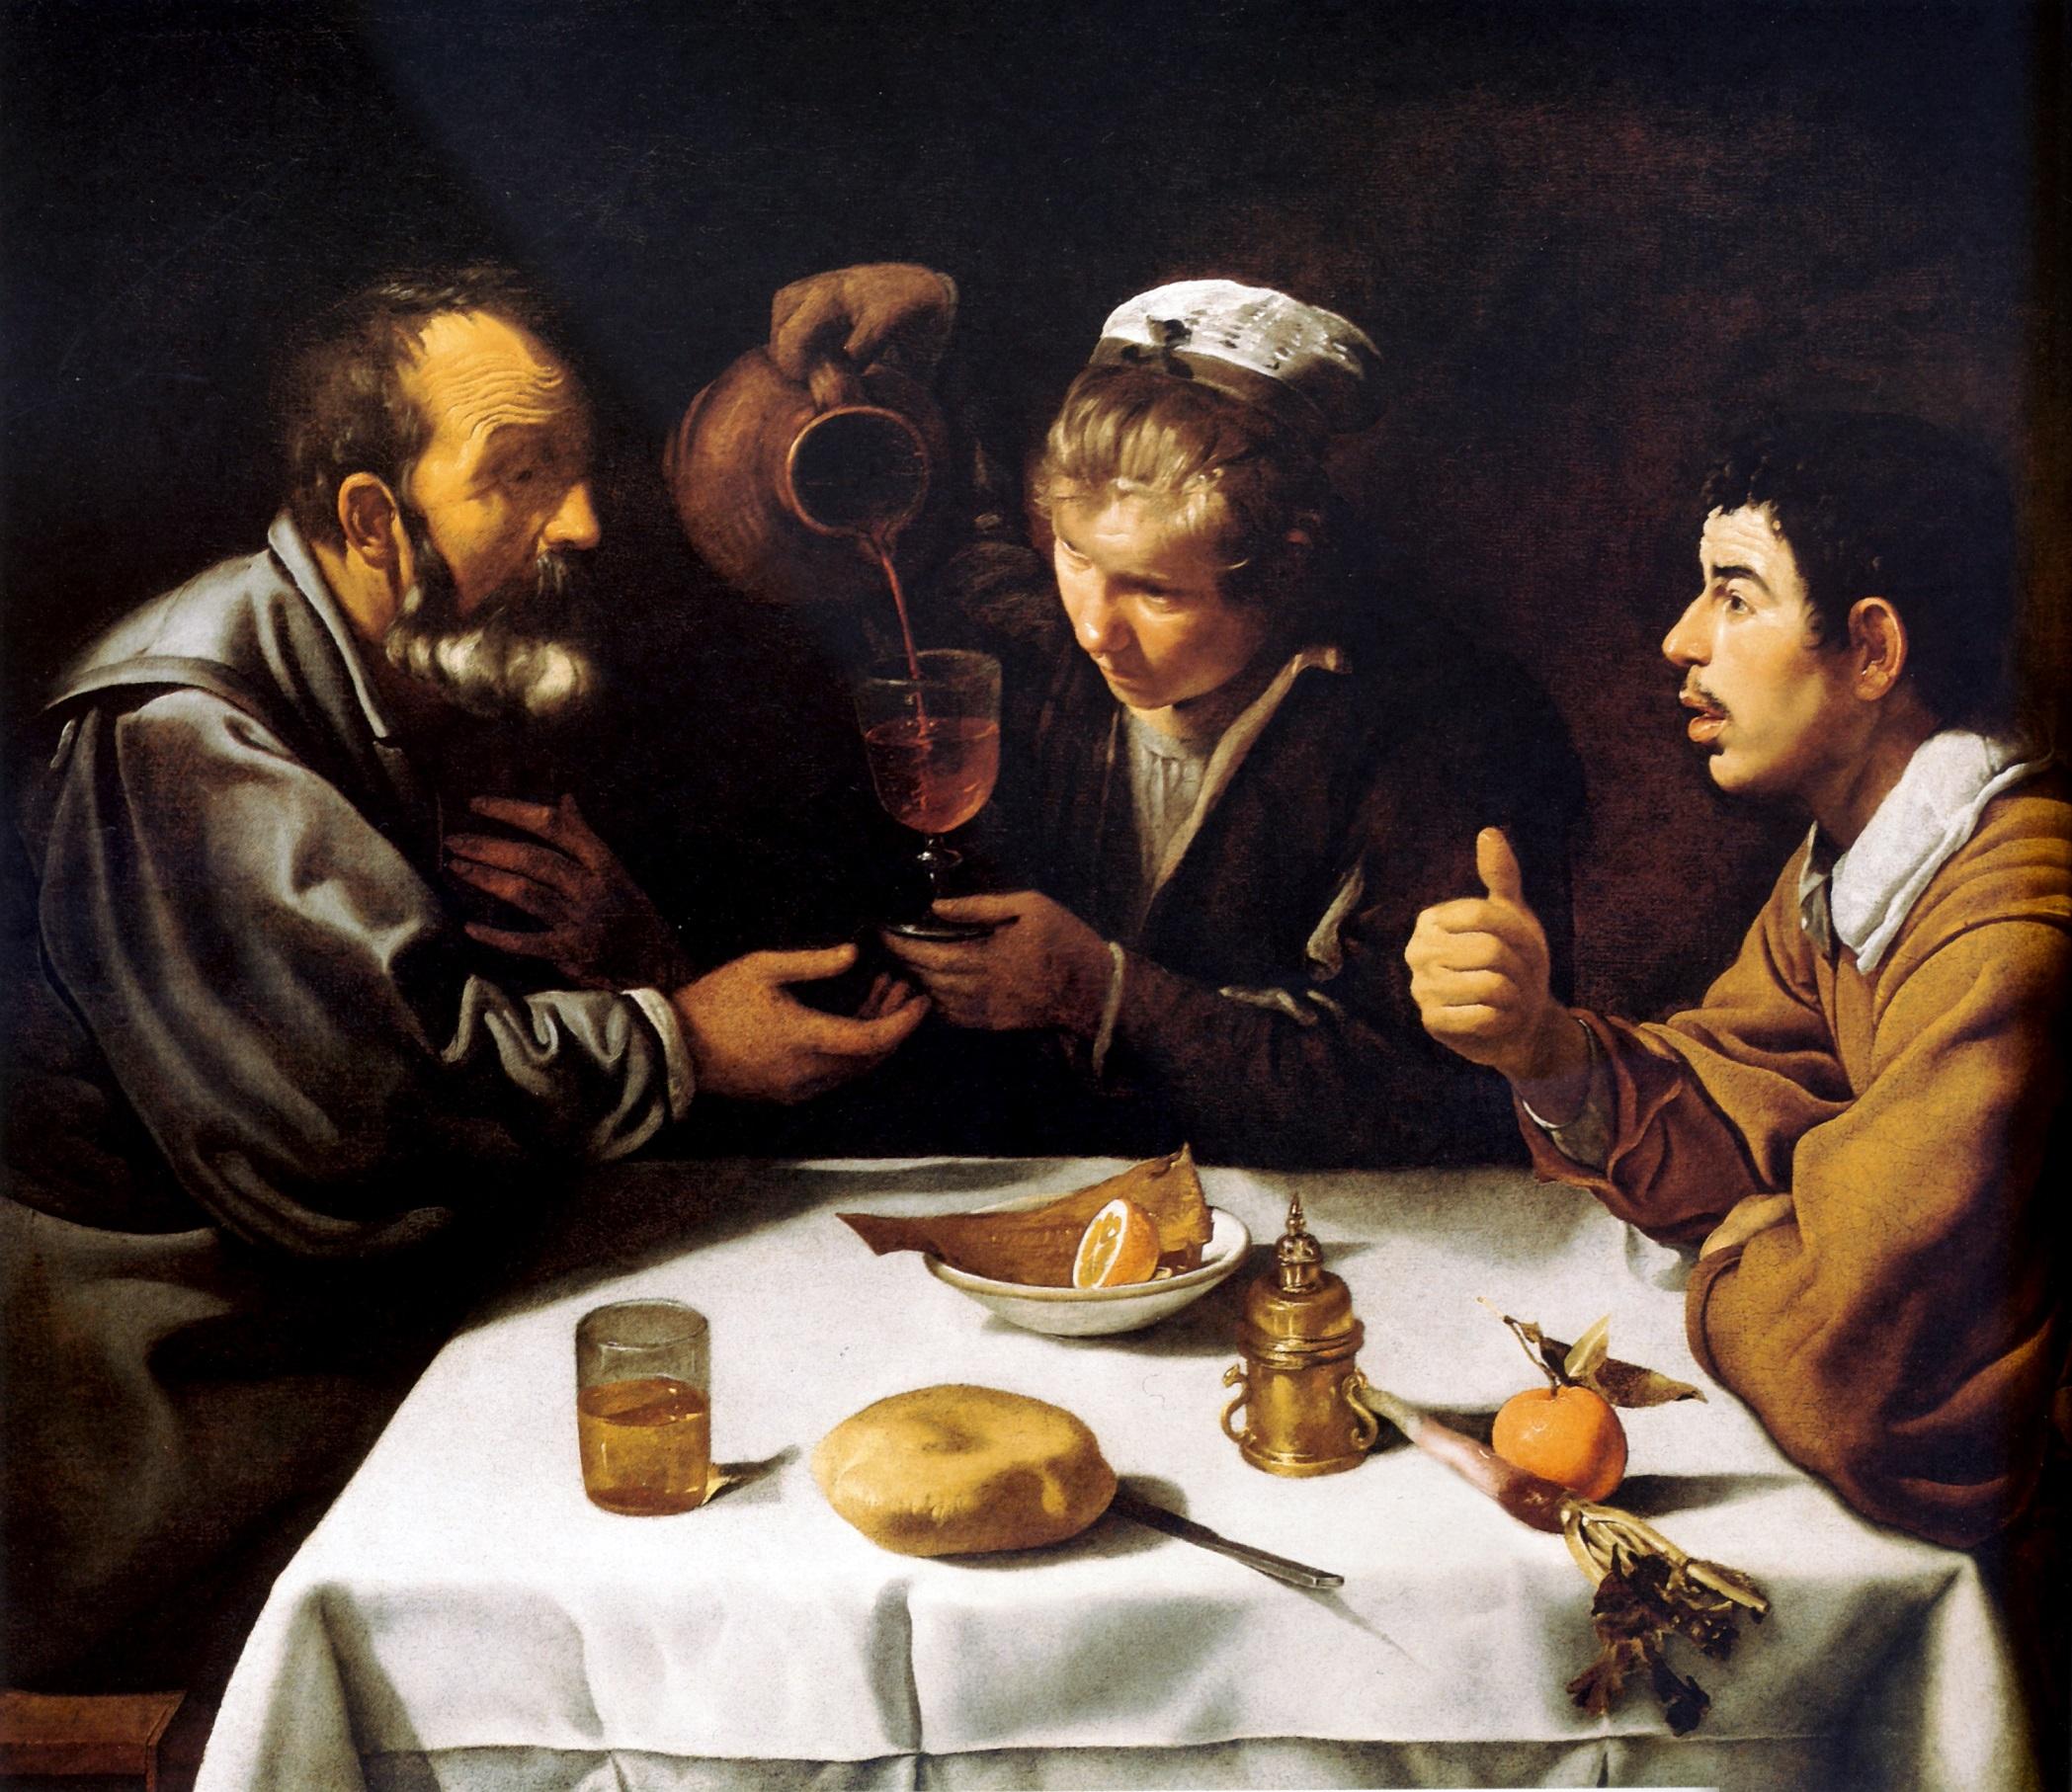 7 El_almuerzo,_by_Diego_Velázquez